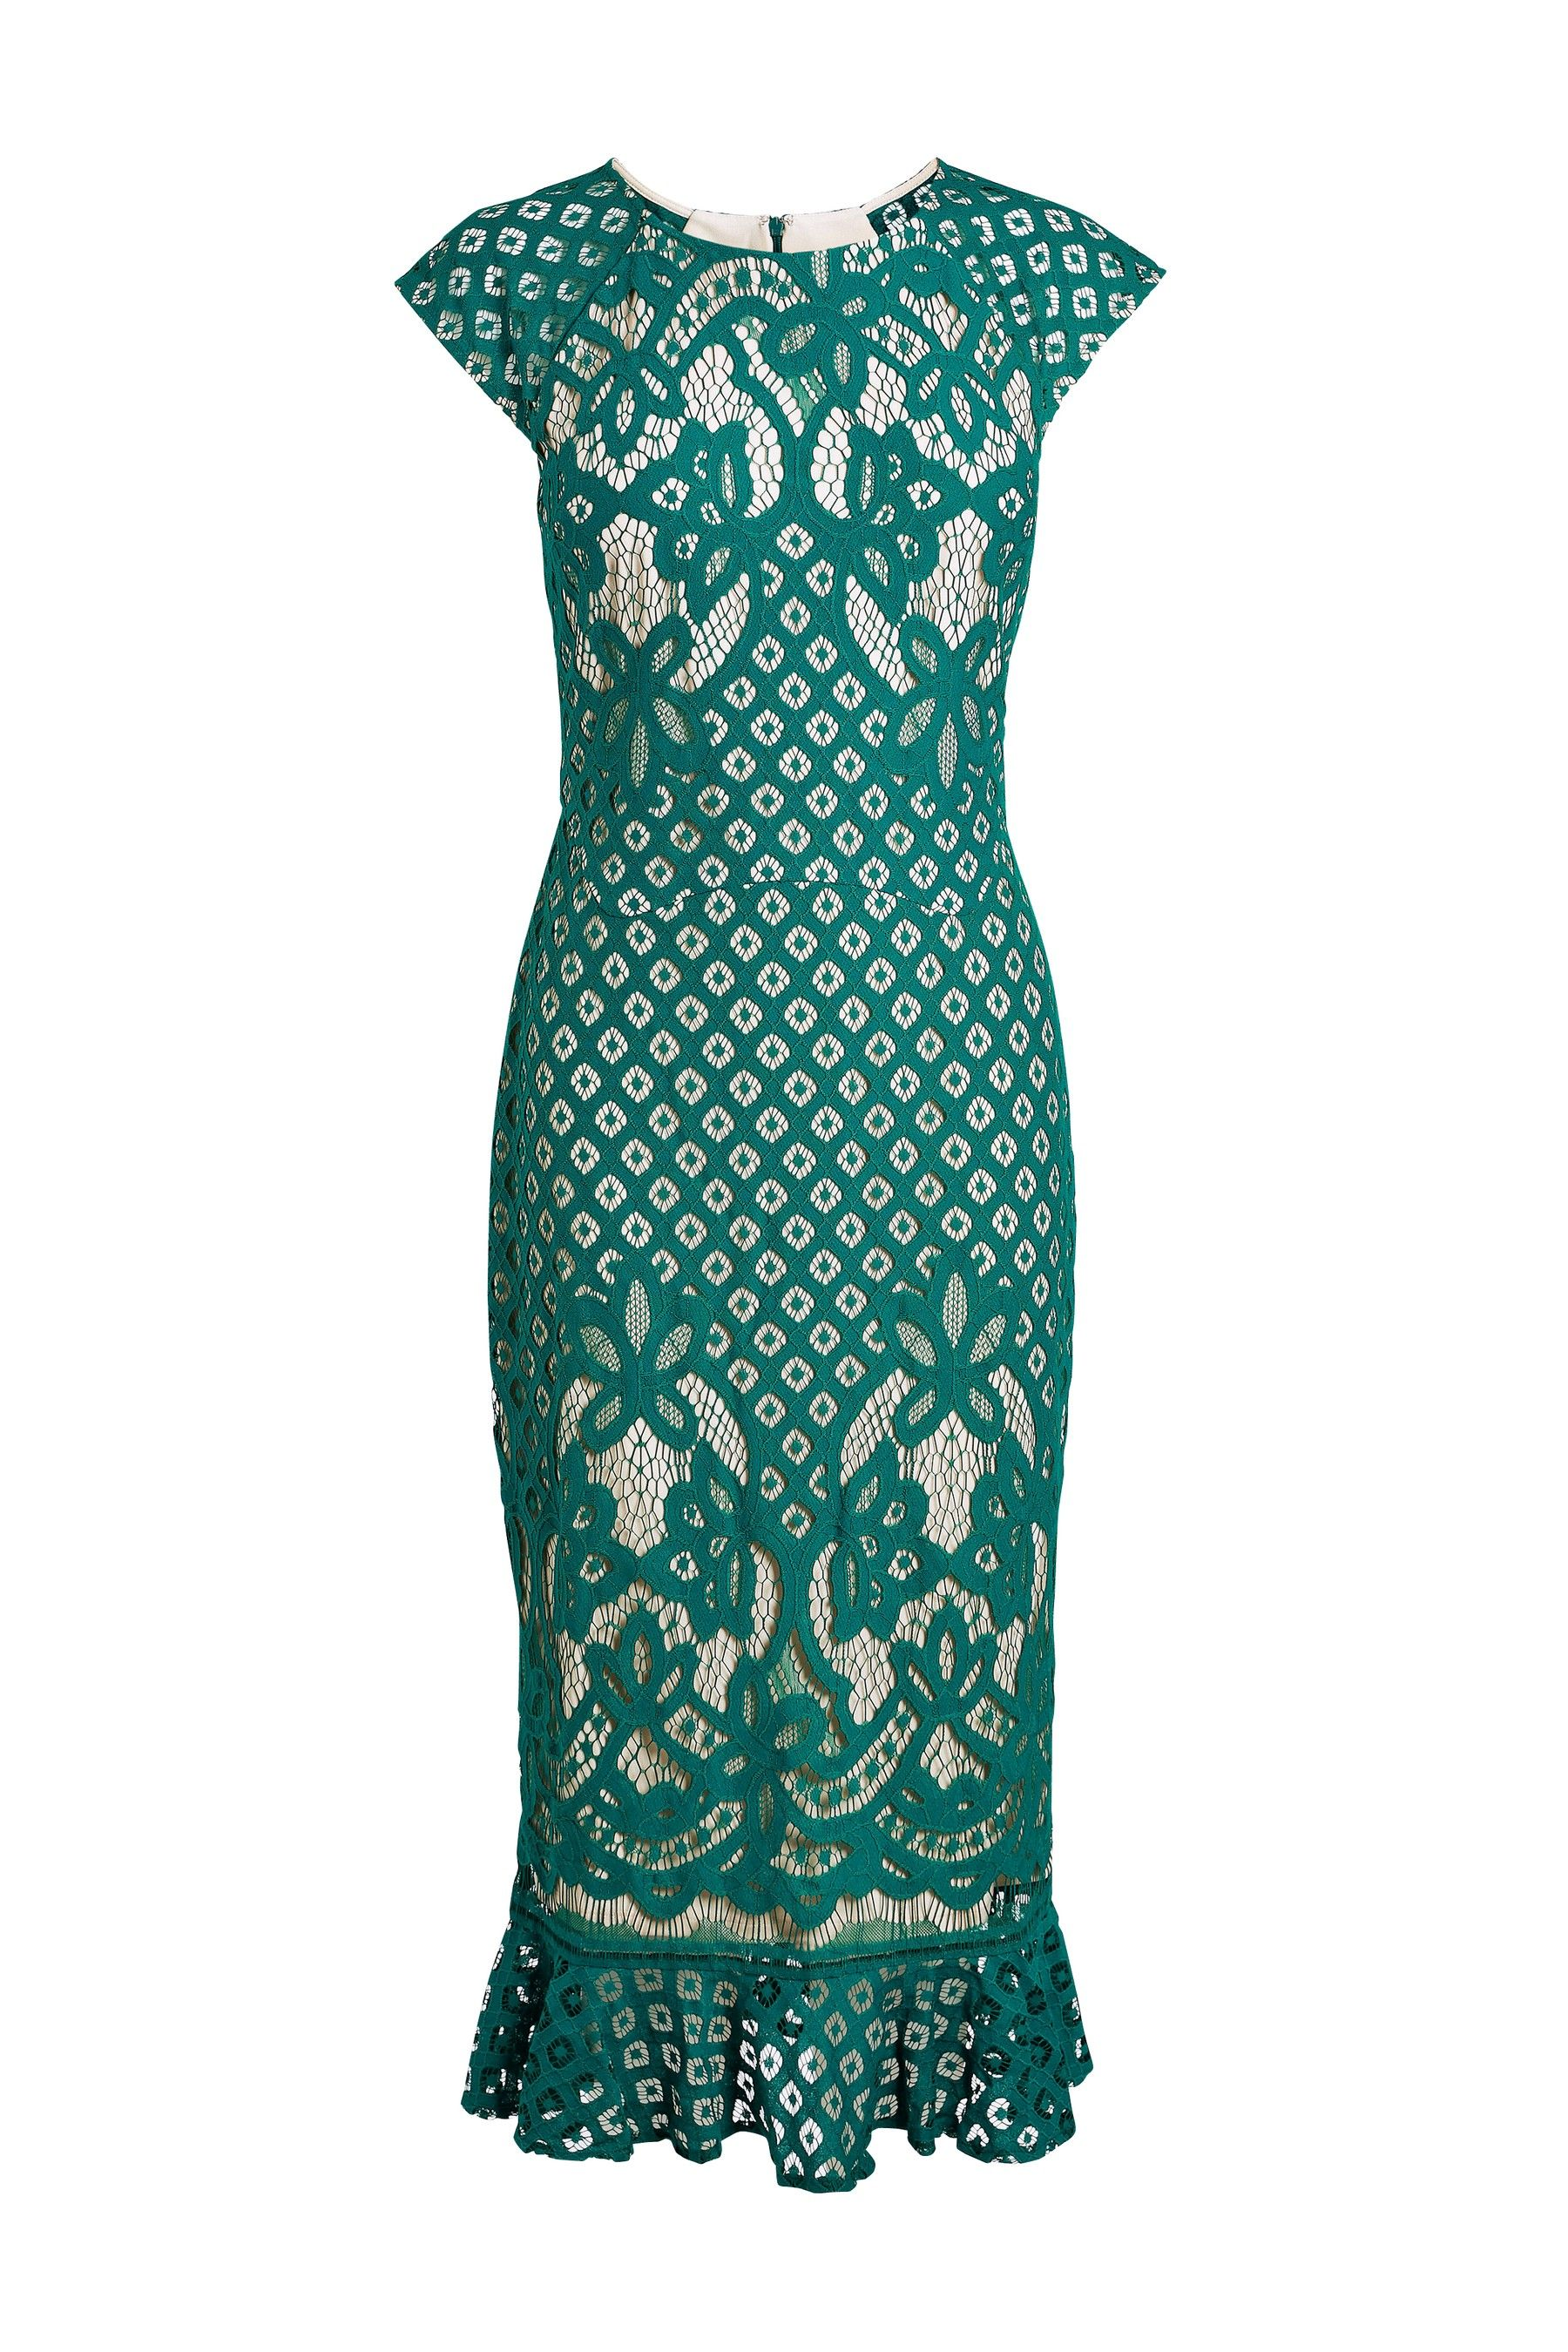 6fcb0e7d880e Womens Next Teal Lace Flute Hem Dress - Green